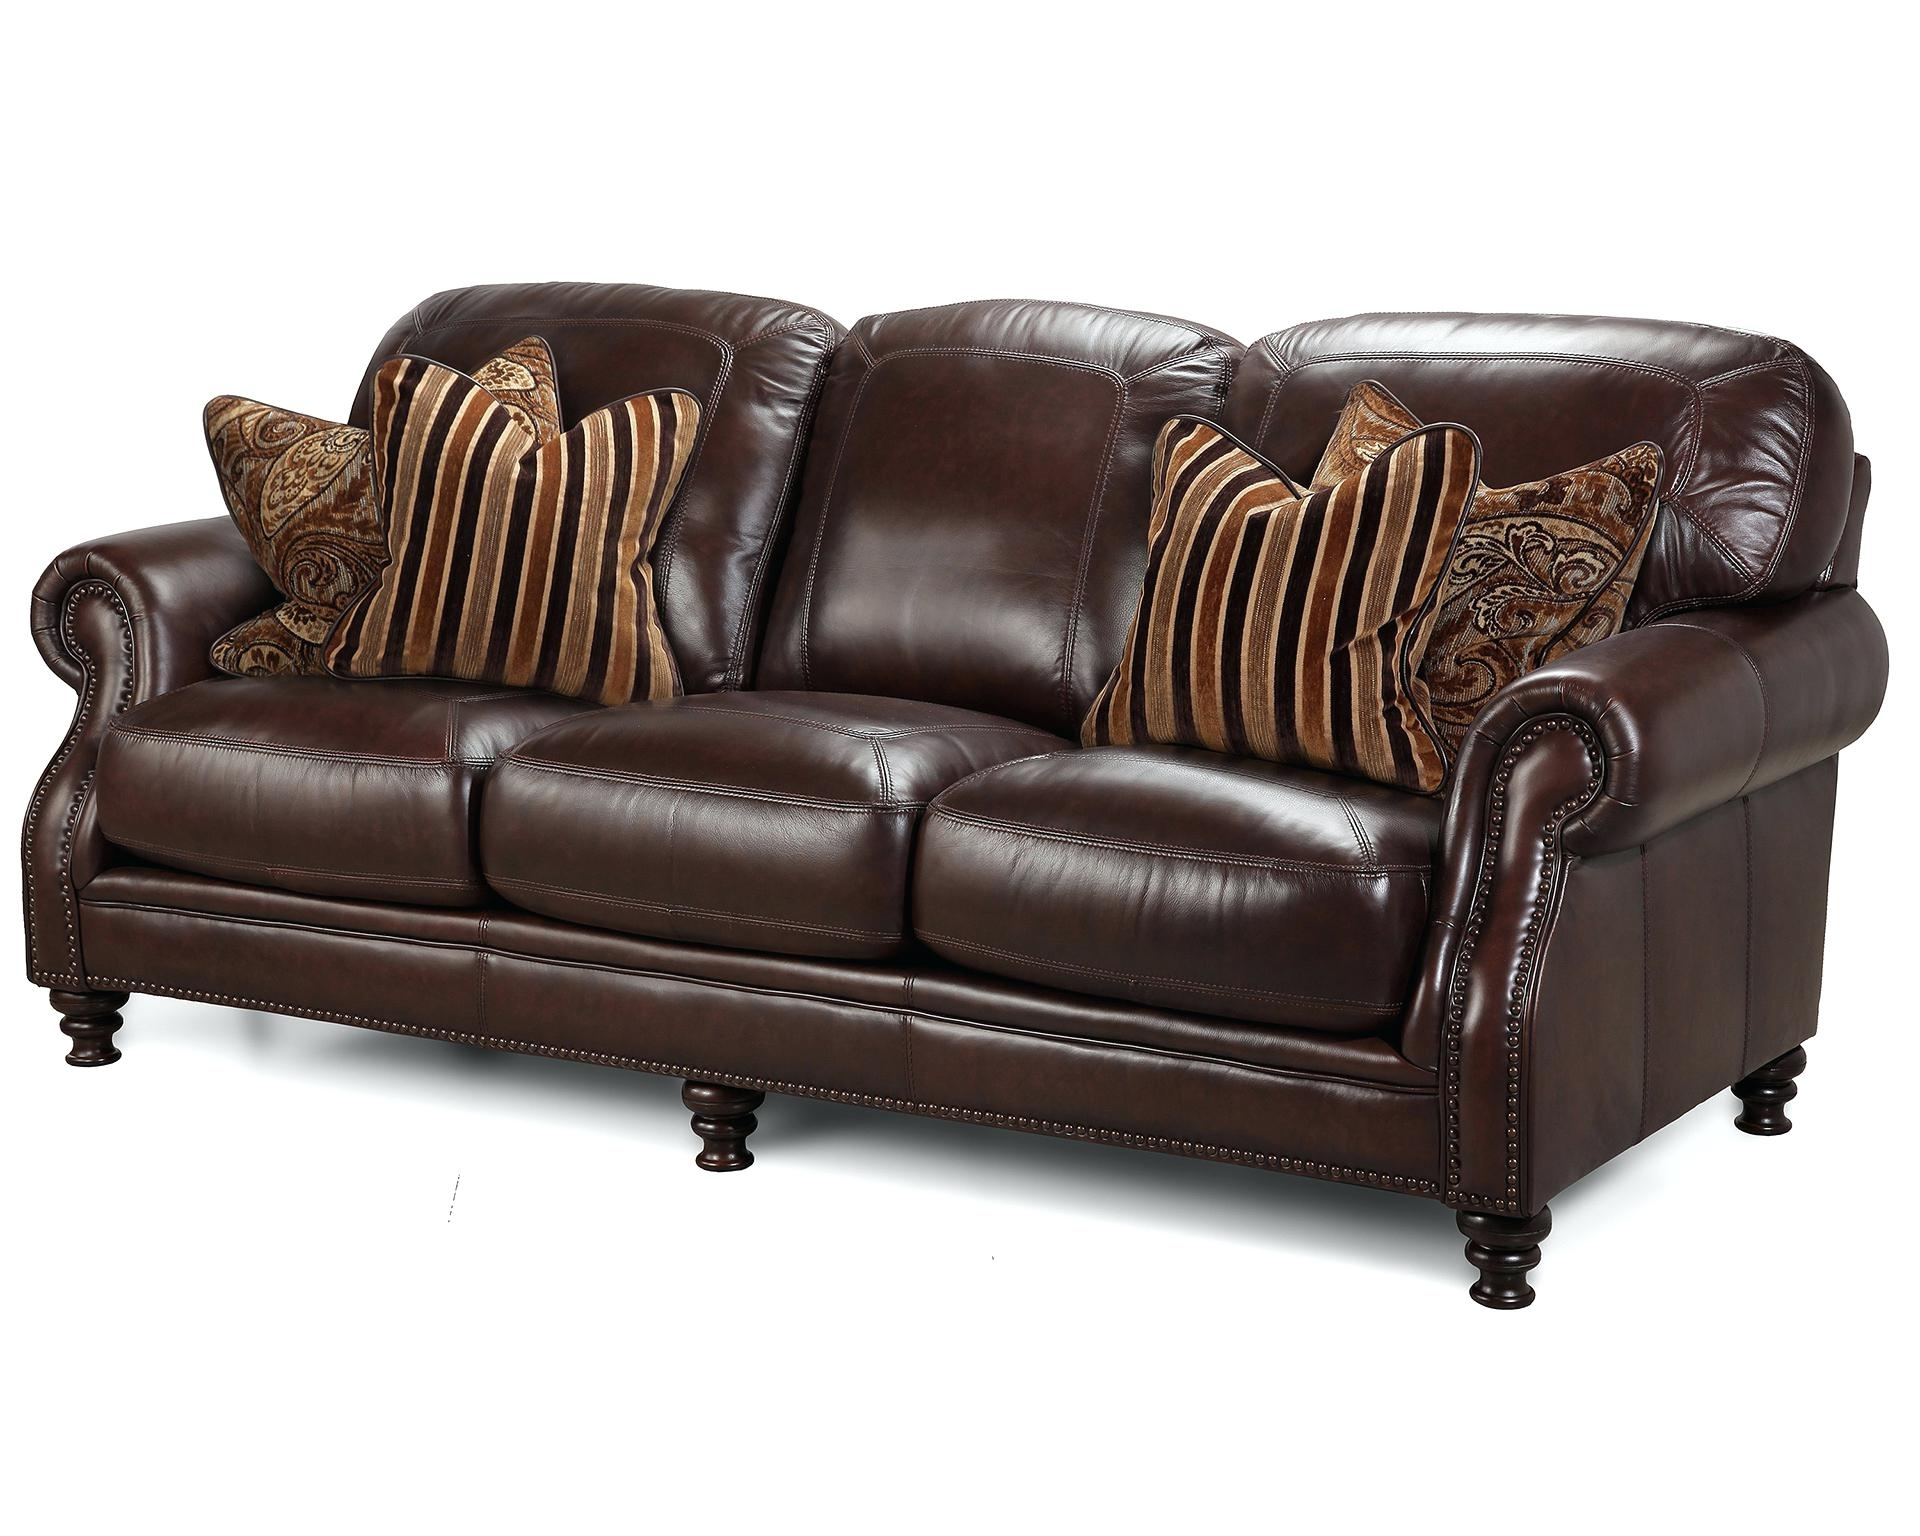 Recent Berkline Home Theater Seating Costco Sofas Sofas Marvelous Leather Inside Berkline Sofas (View 15 of 20)